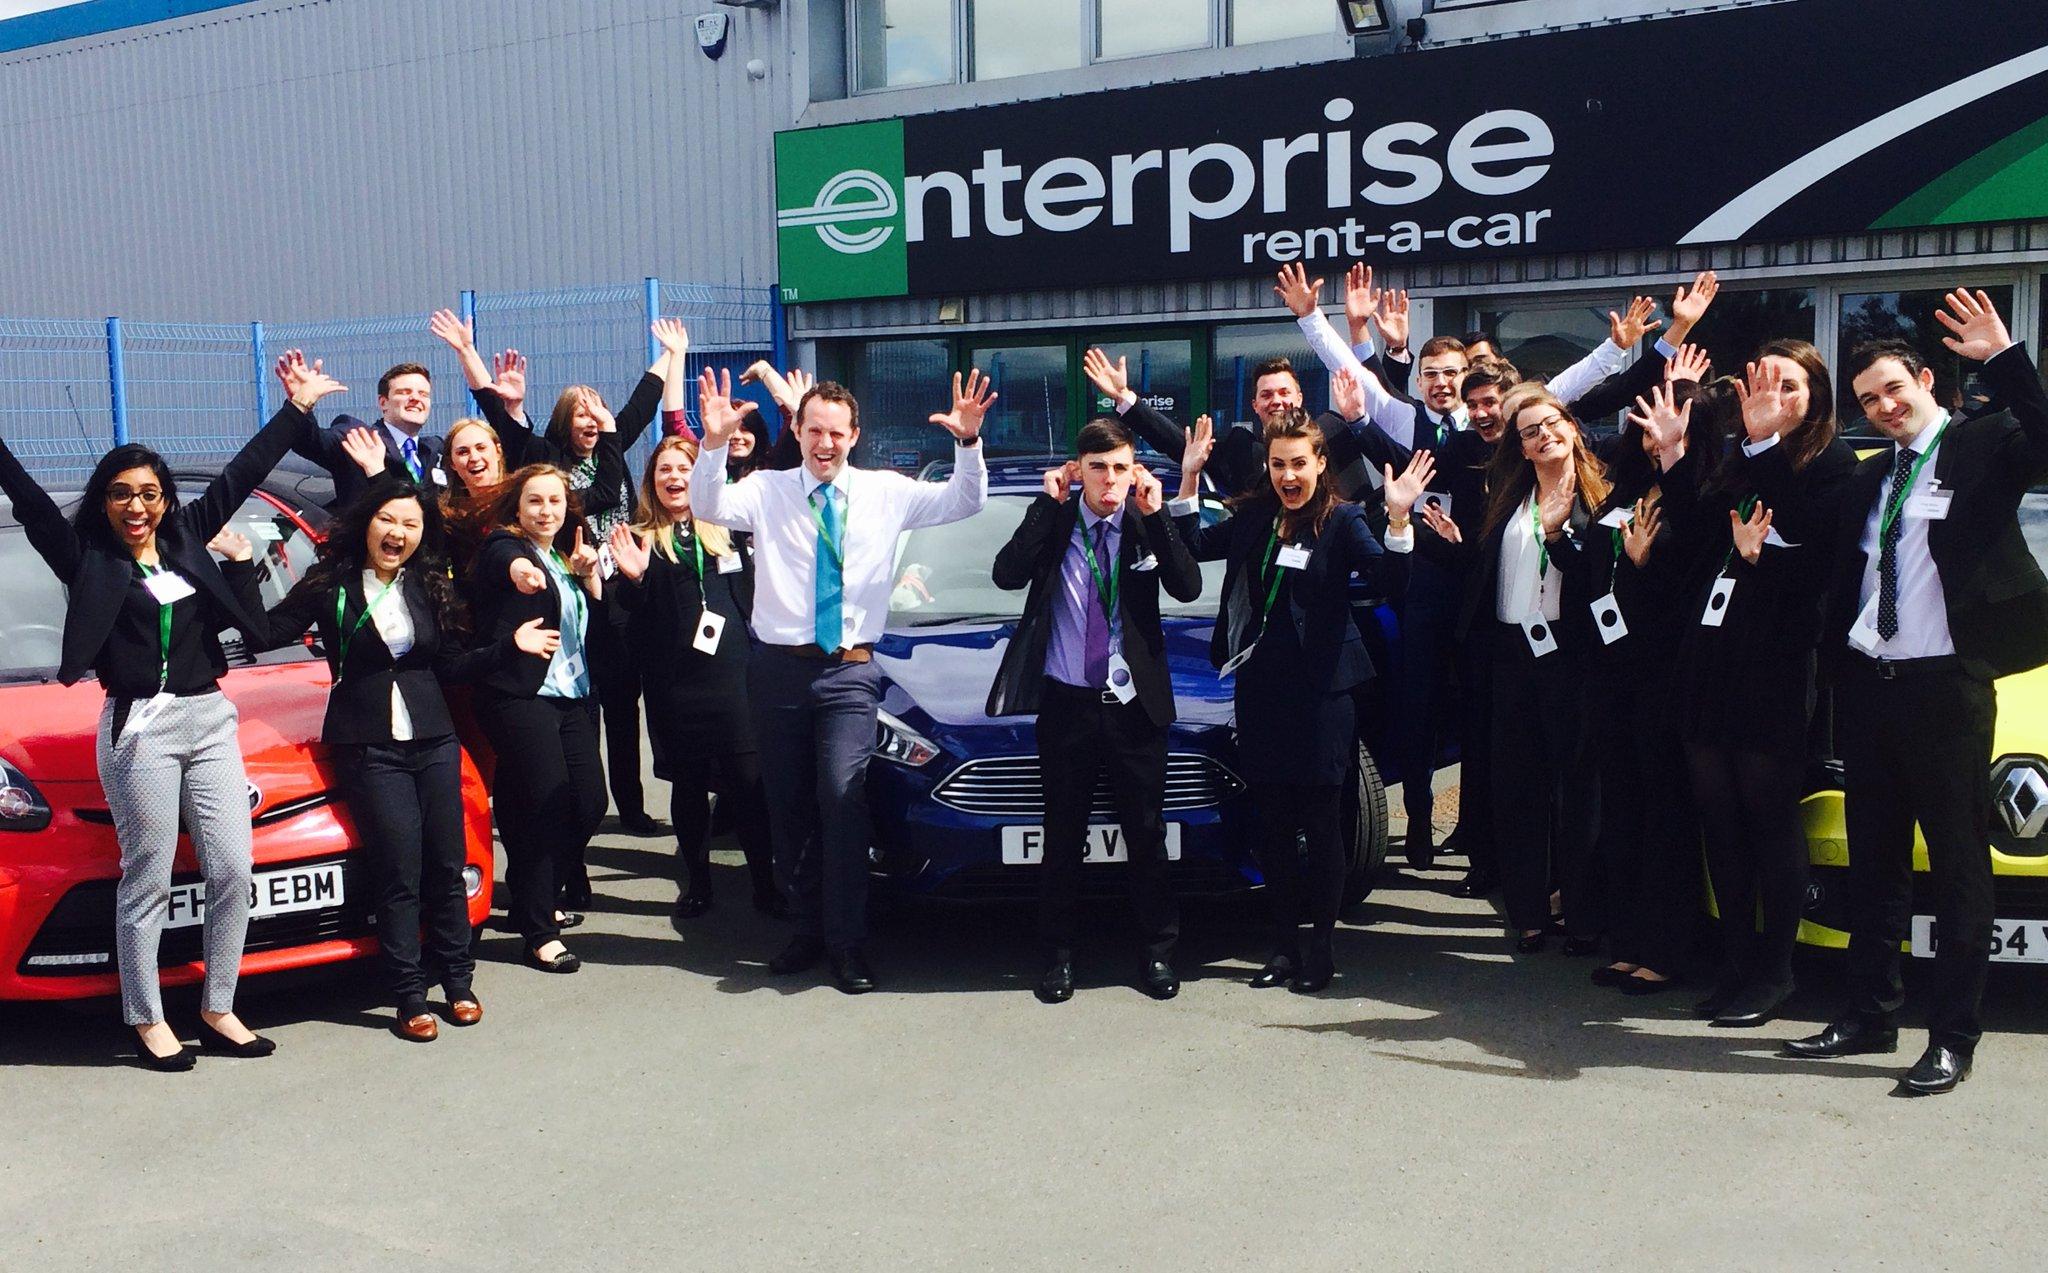 Enterprise Rent-A-Car UK Employees